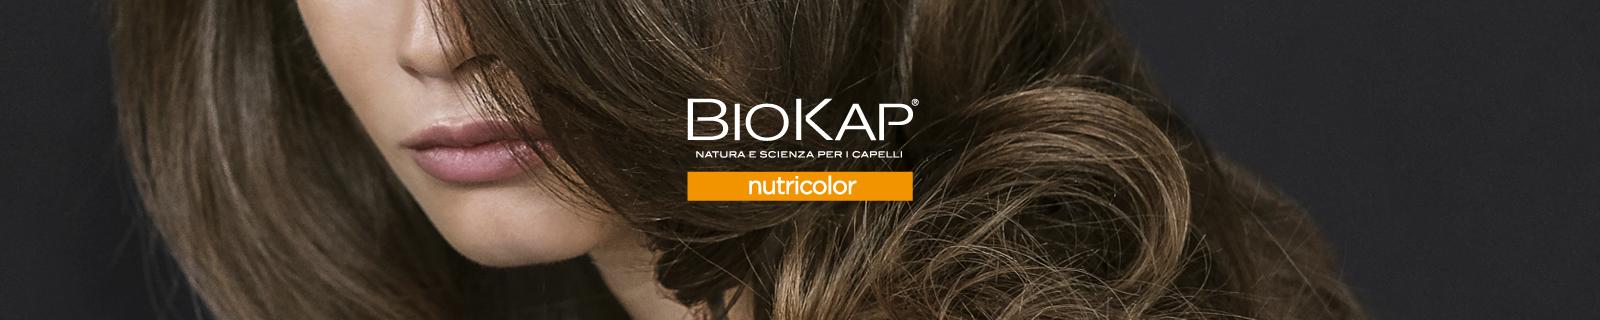 Biokap Nutricolor